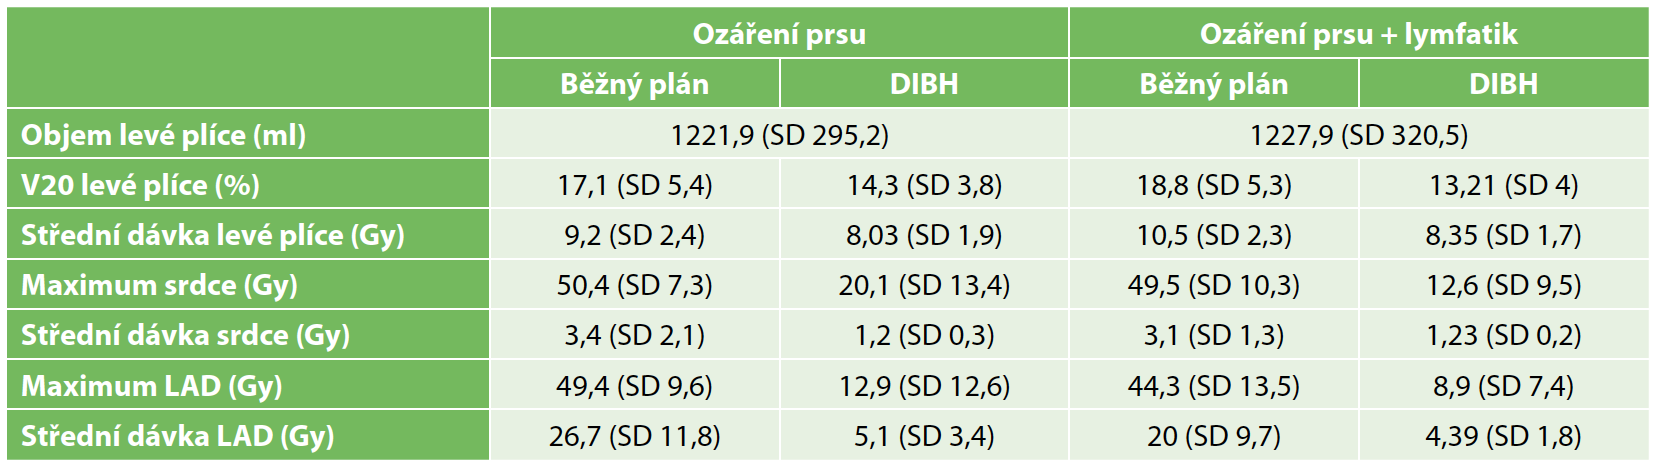 Tab. 2b: Dávky na rizikové struktury u pacientek dle cílového objemu<br> Tab. 2b: Doses to organs at risk for cohorts based on different target volume